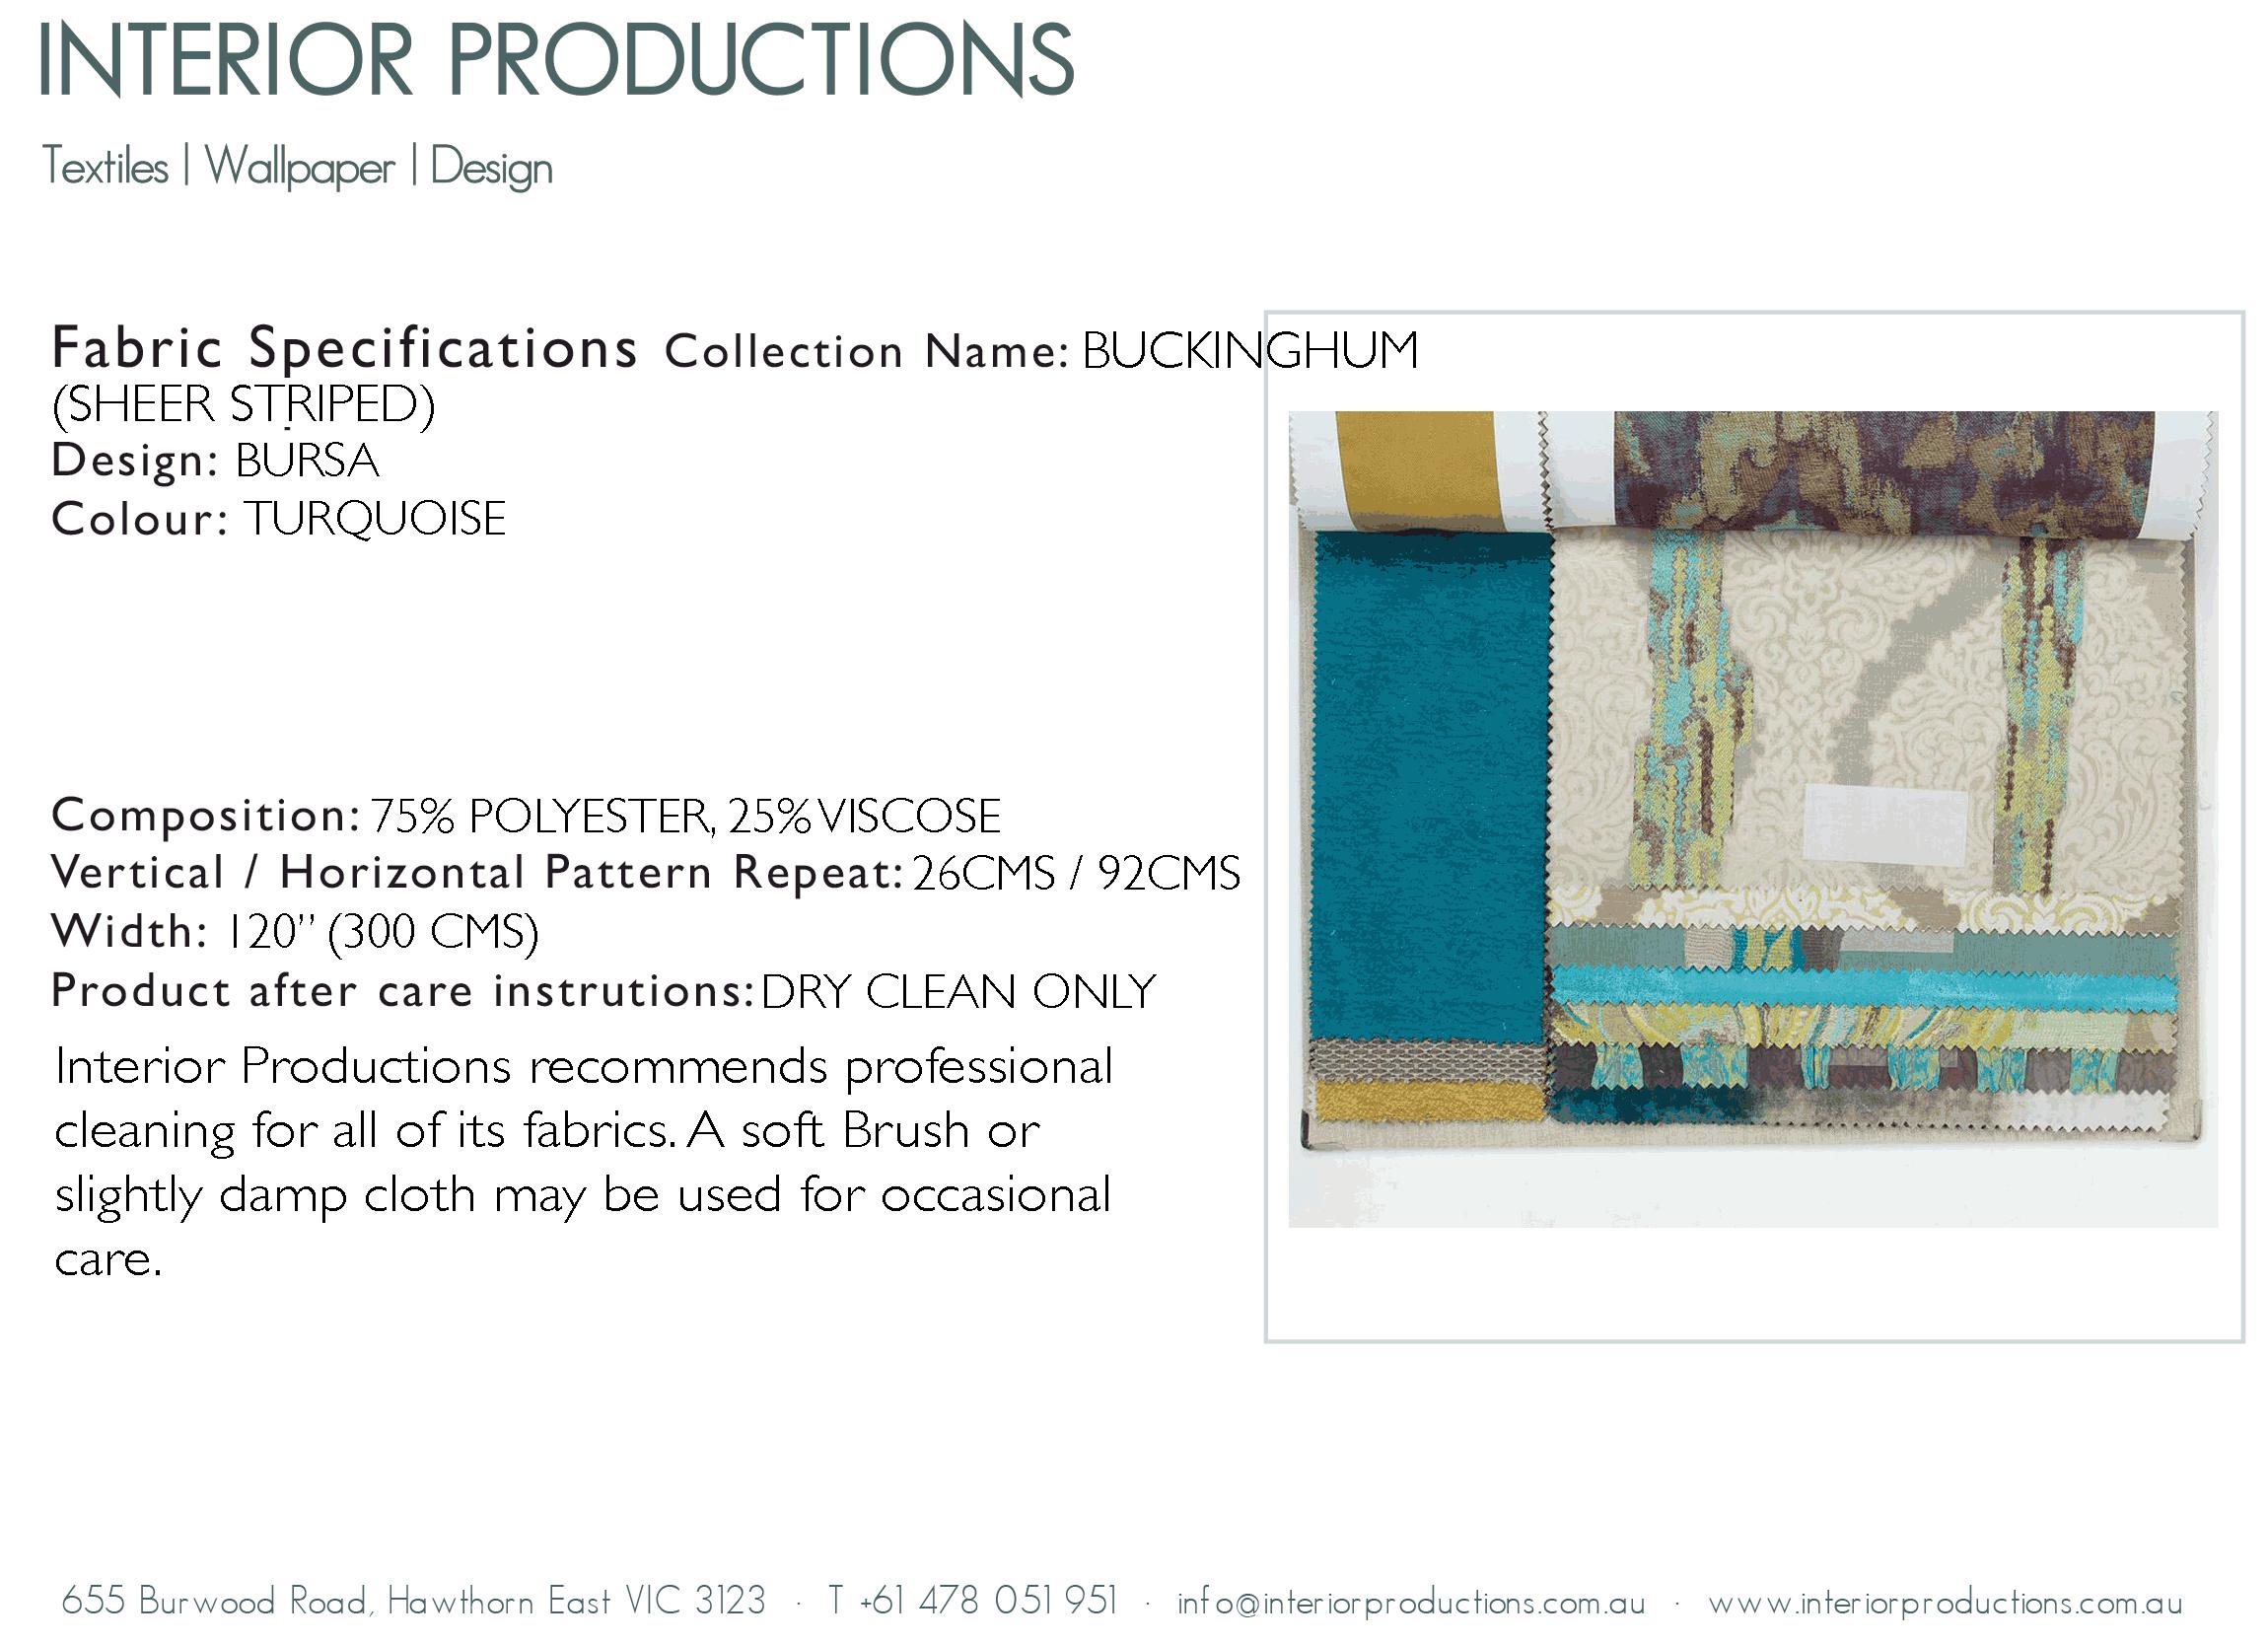 interior_productions_BURSA---TURQUOISE